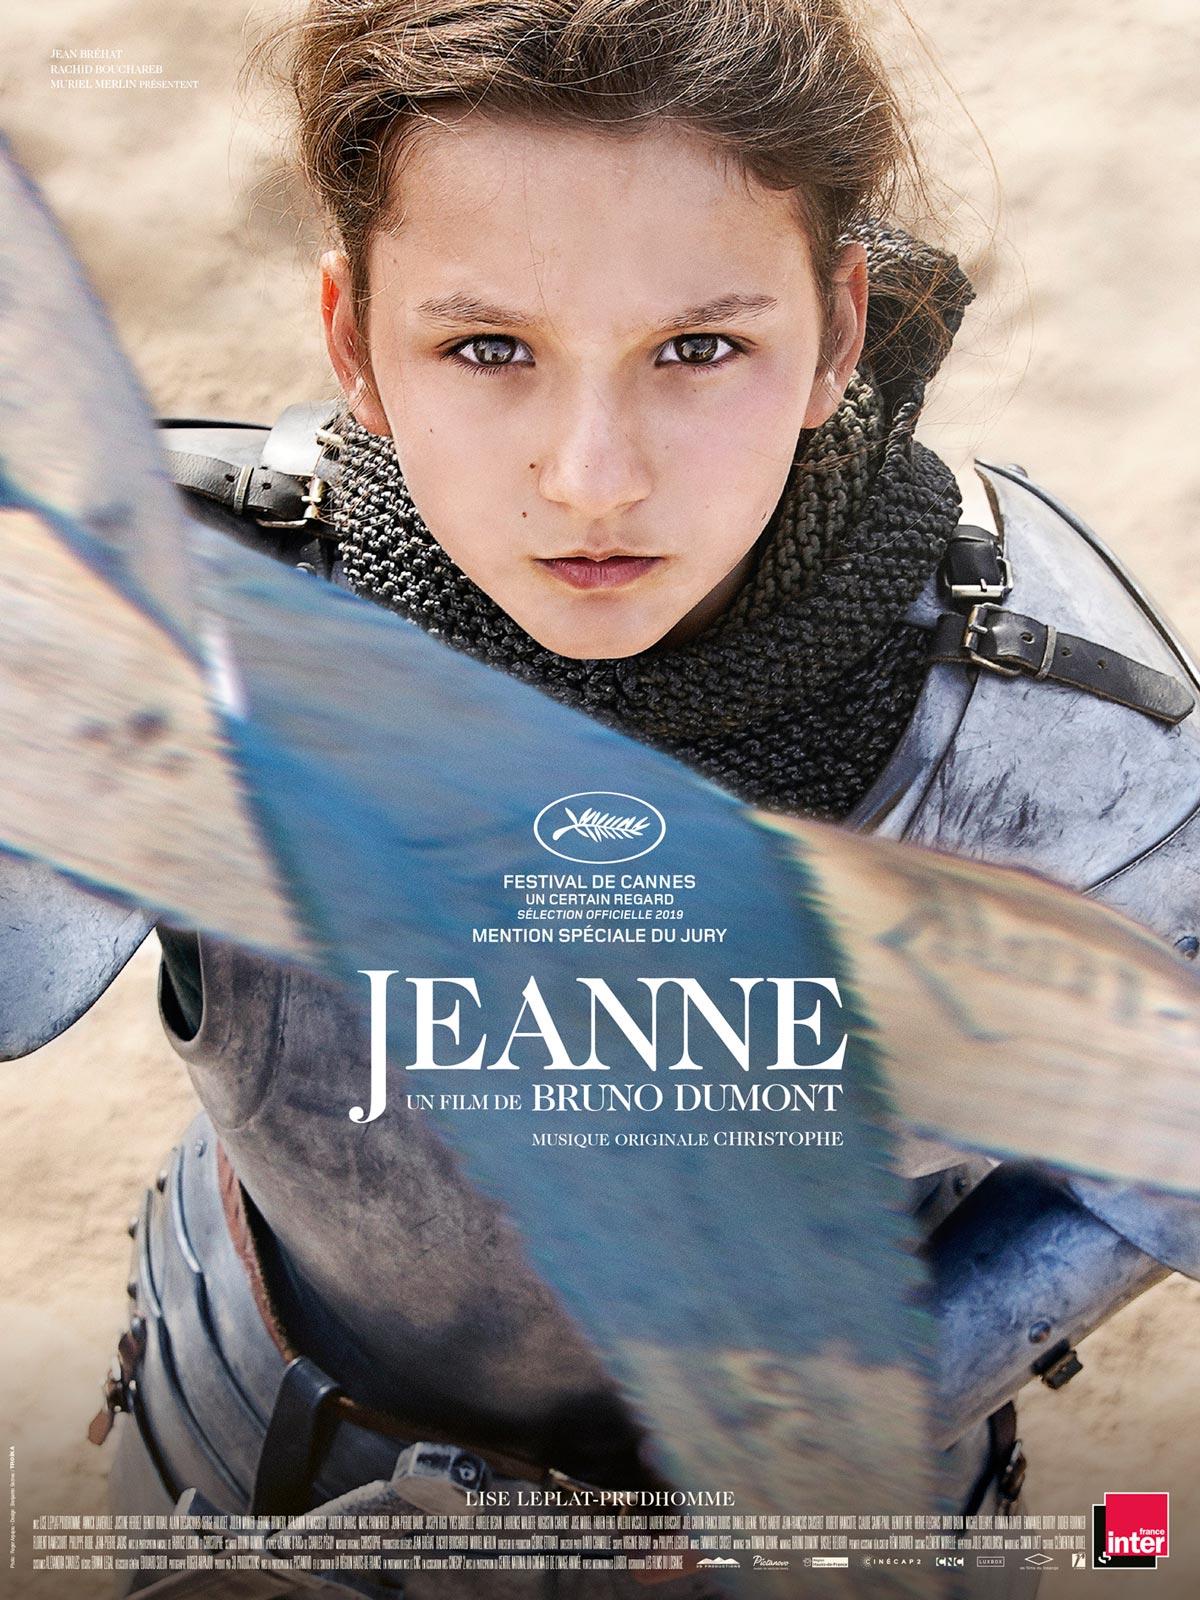 Jeanne Une âme seule ne chante et ne pleure